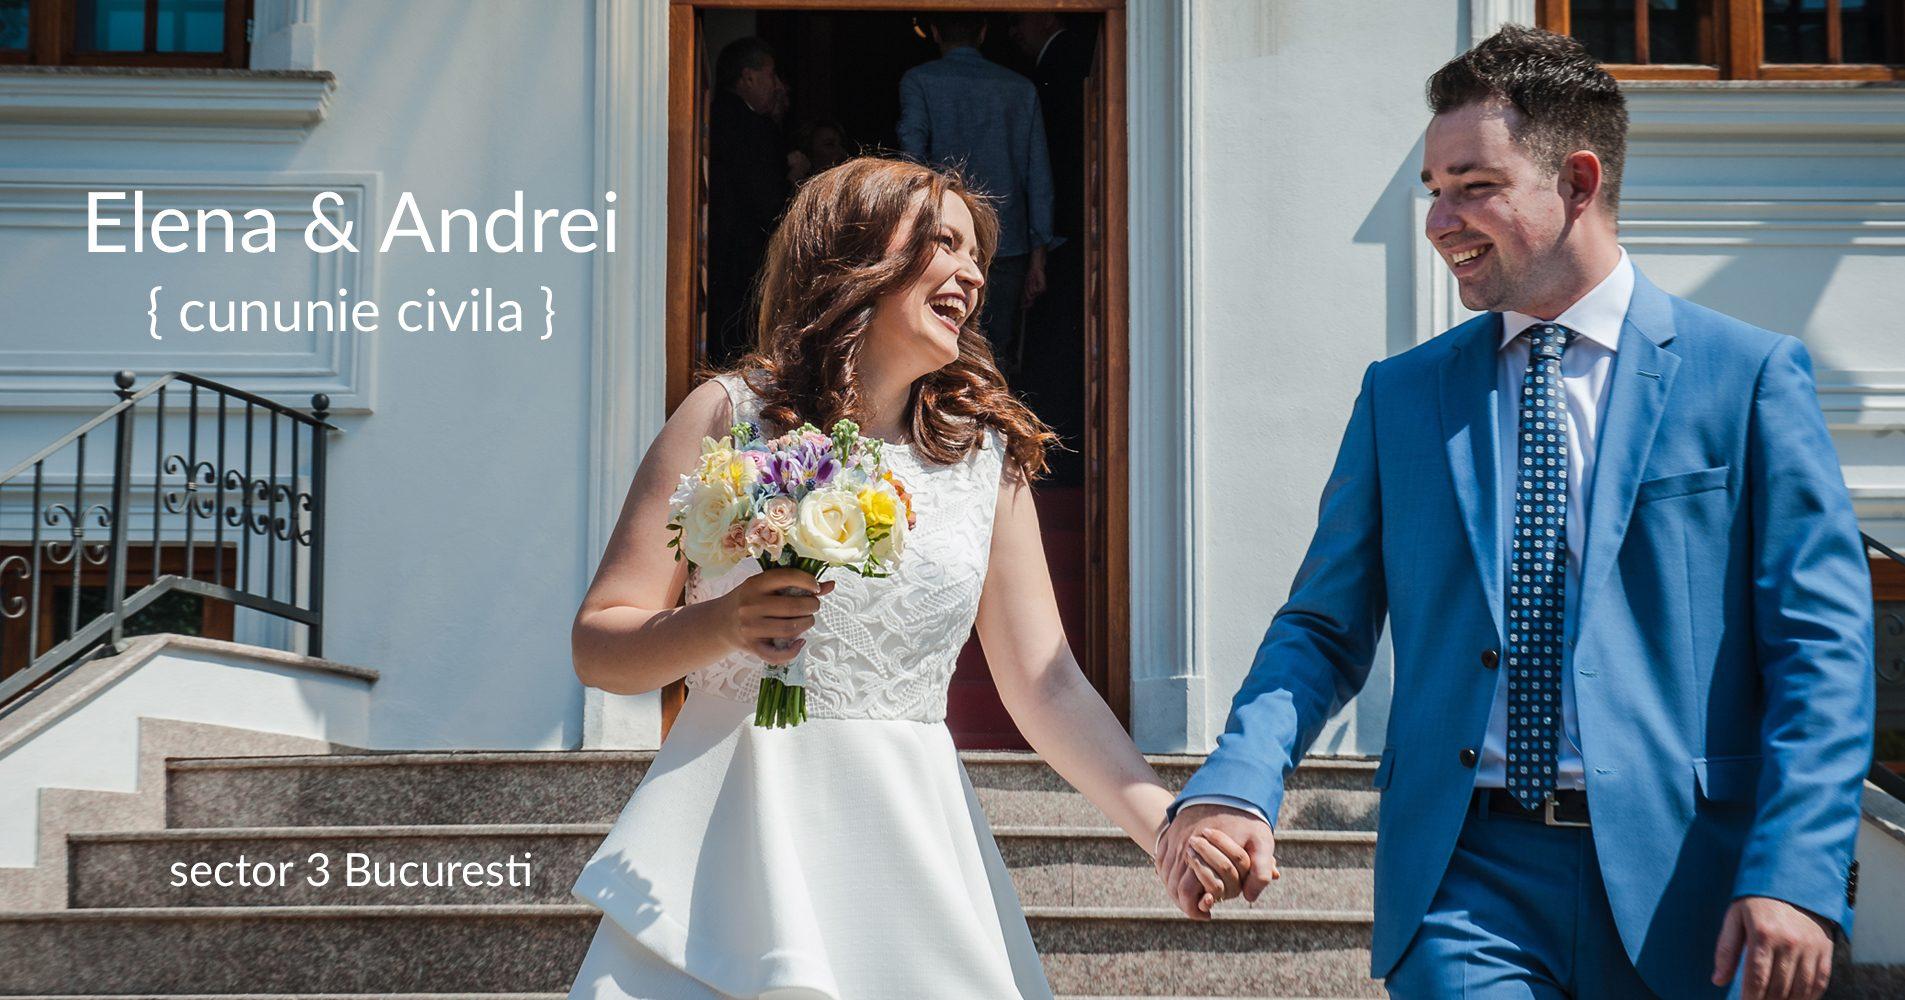 Fotograf nunta in Bucuresti | www.danielgritu.ro | Ioana Picos si Mihai Fagadaru